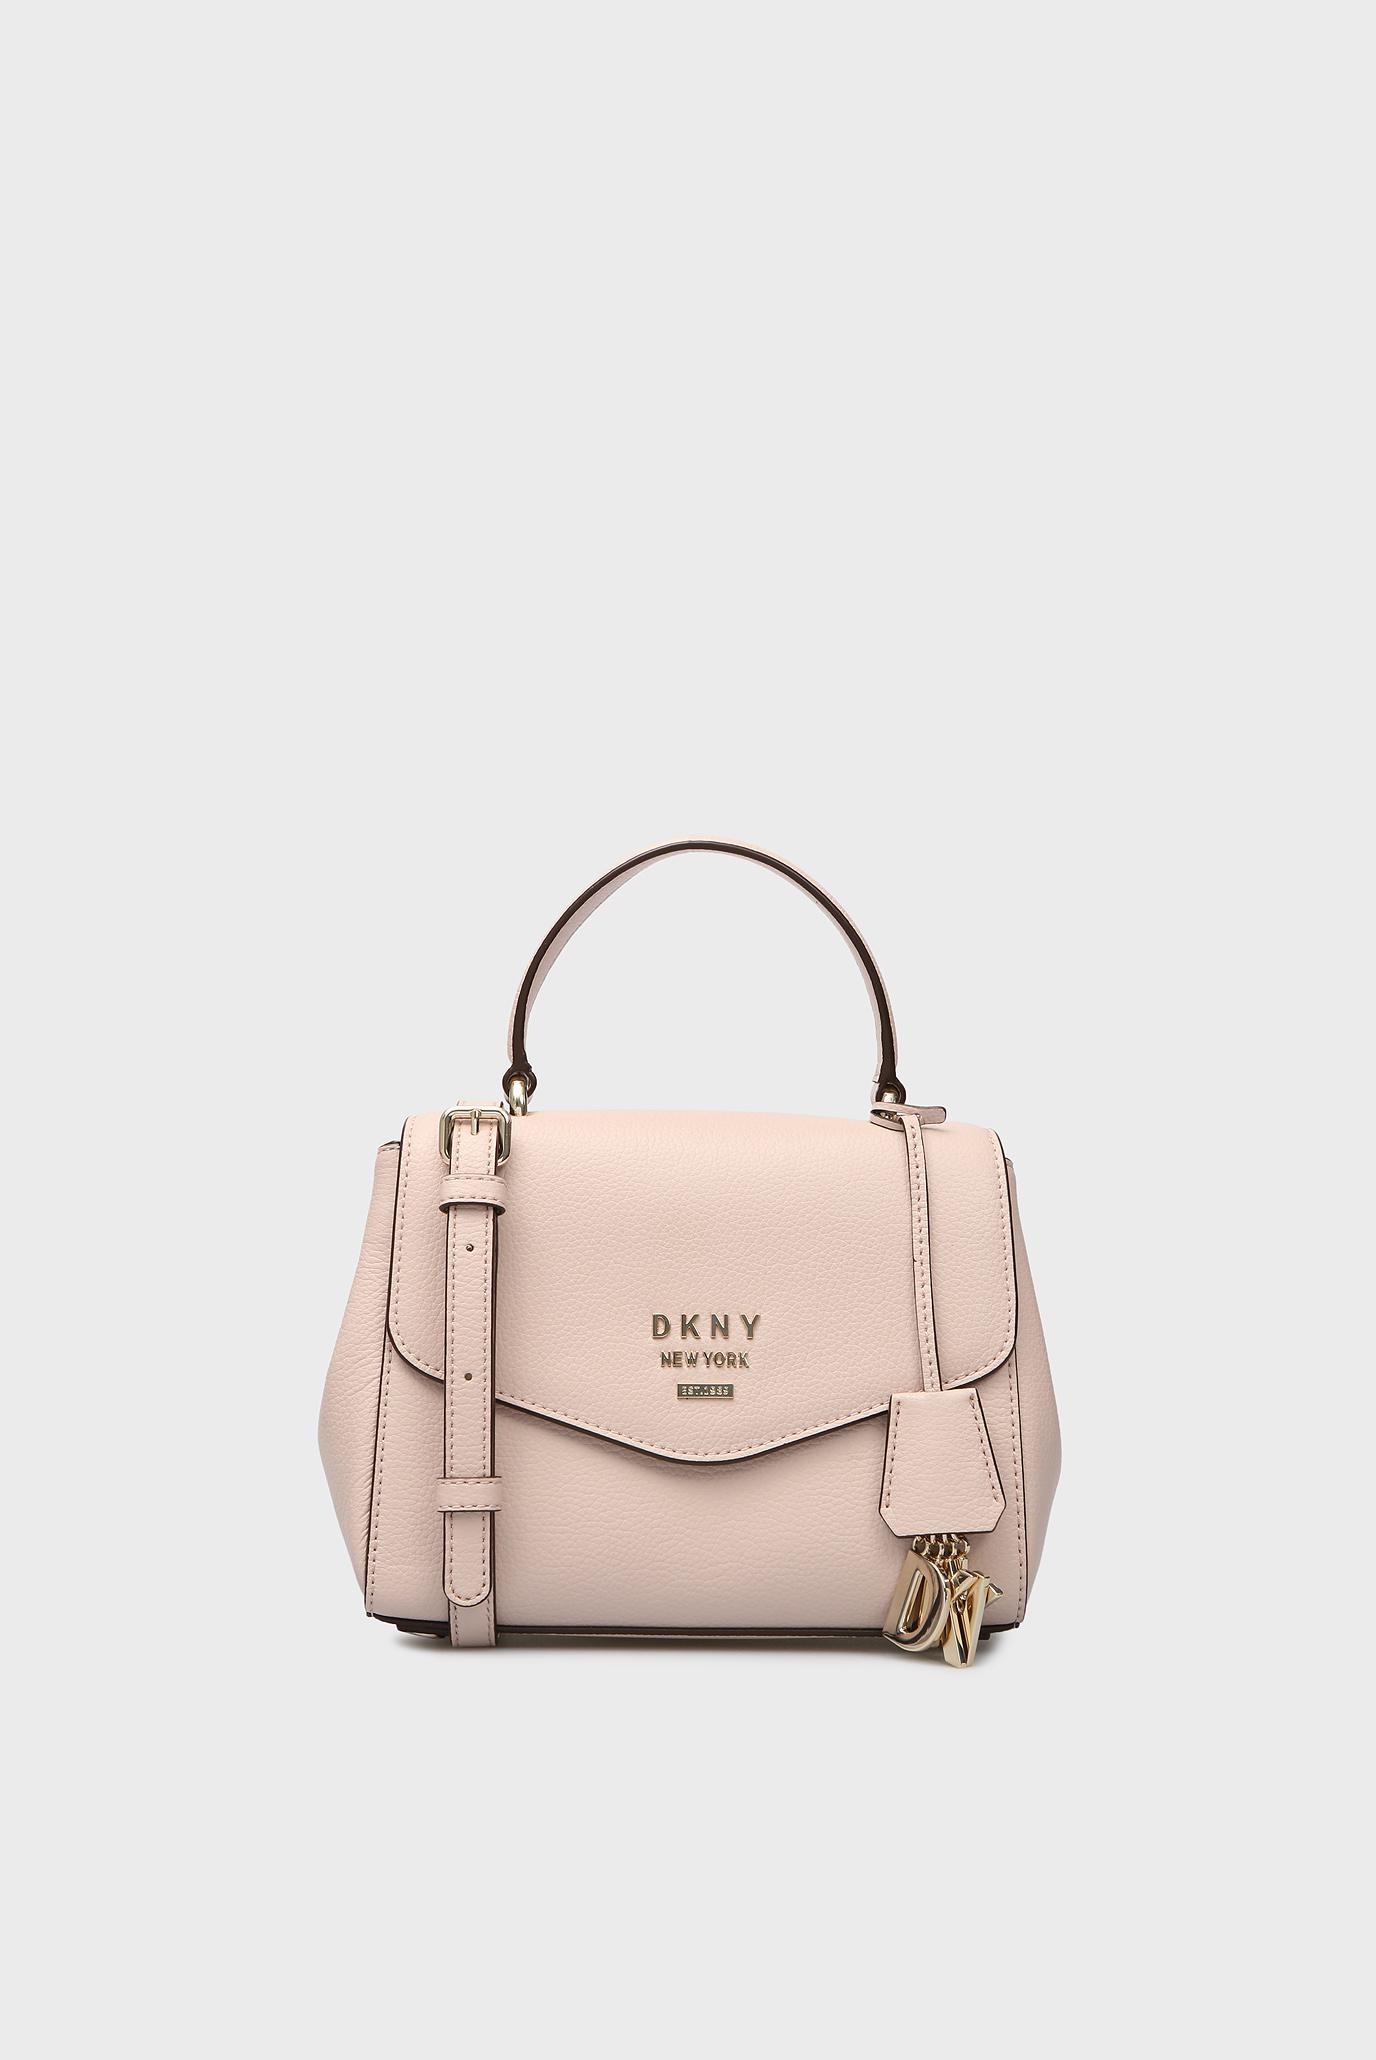 45b02cae8df5 Купить Женская пудровая кожаная сумка через плечо HUTTON DKNY DKNY R84DA928  – Киев, Украина. Цены в интернет магазине MD Fashion